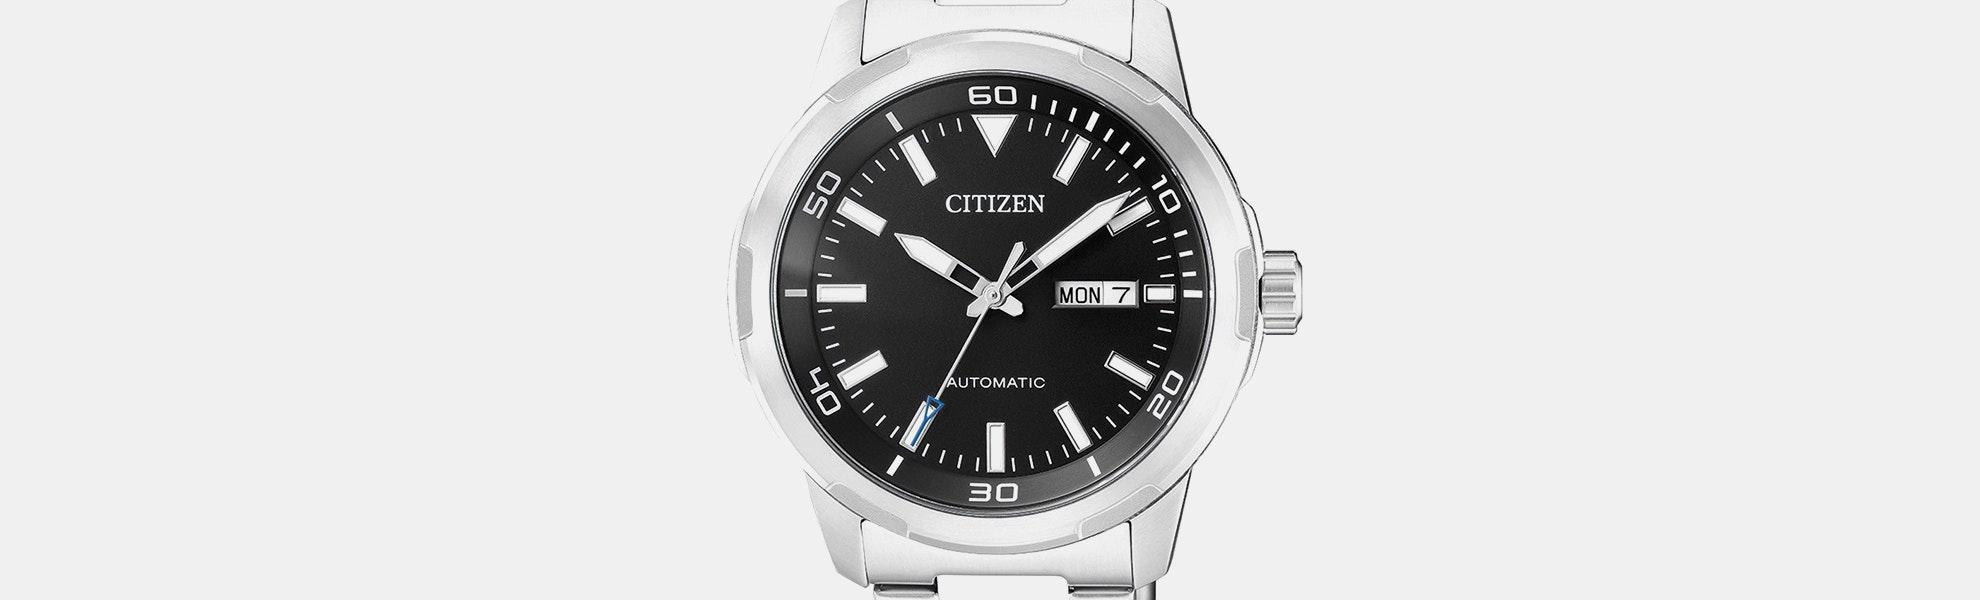 Citizen NH8370 Automatic Watch